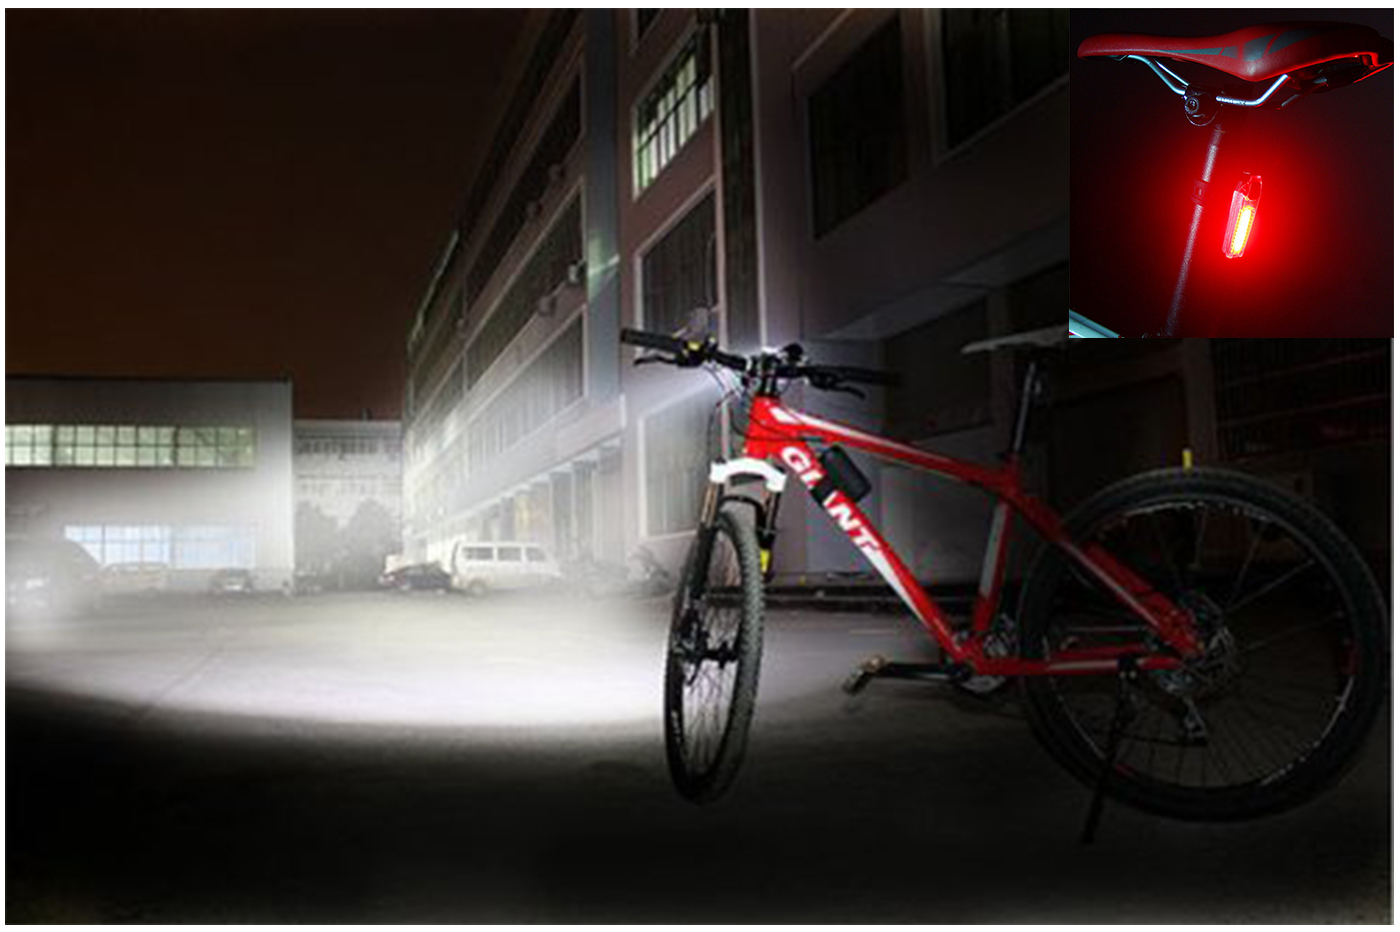 Bes bici beselettronica kit illuminazione bici faro